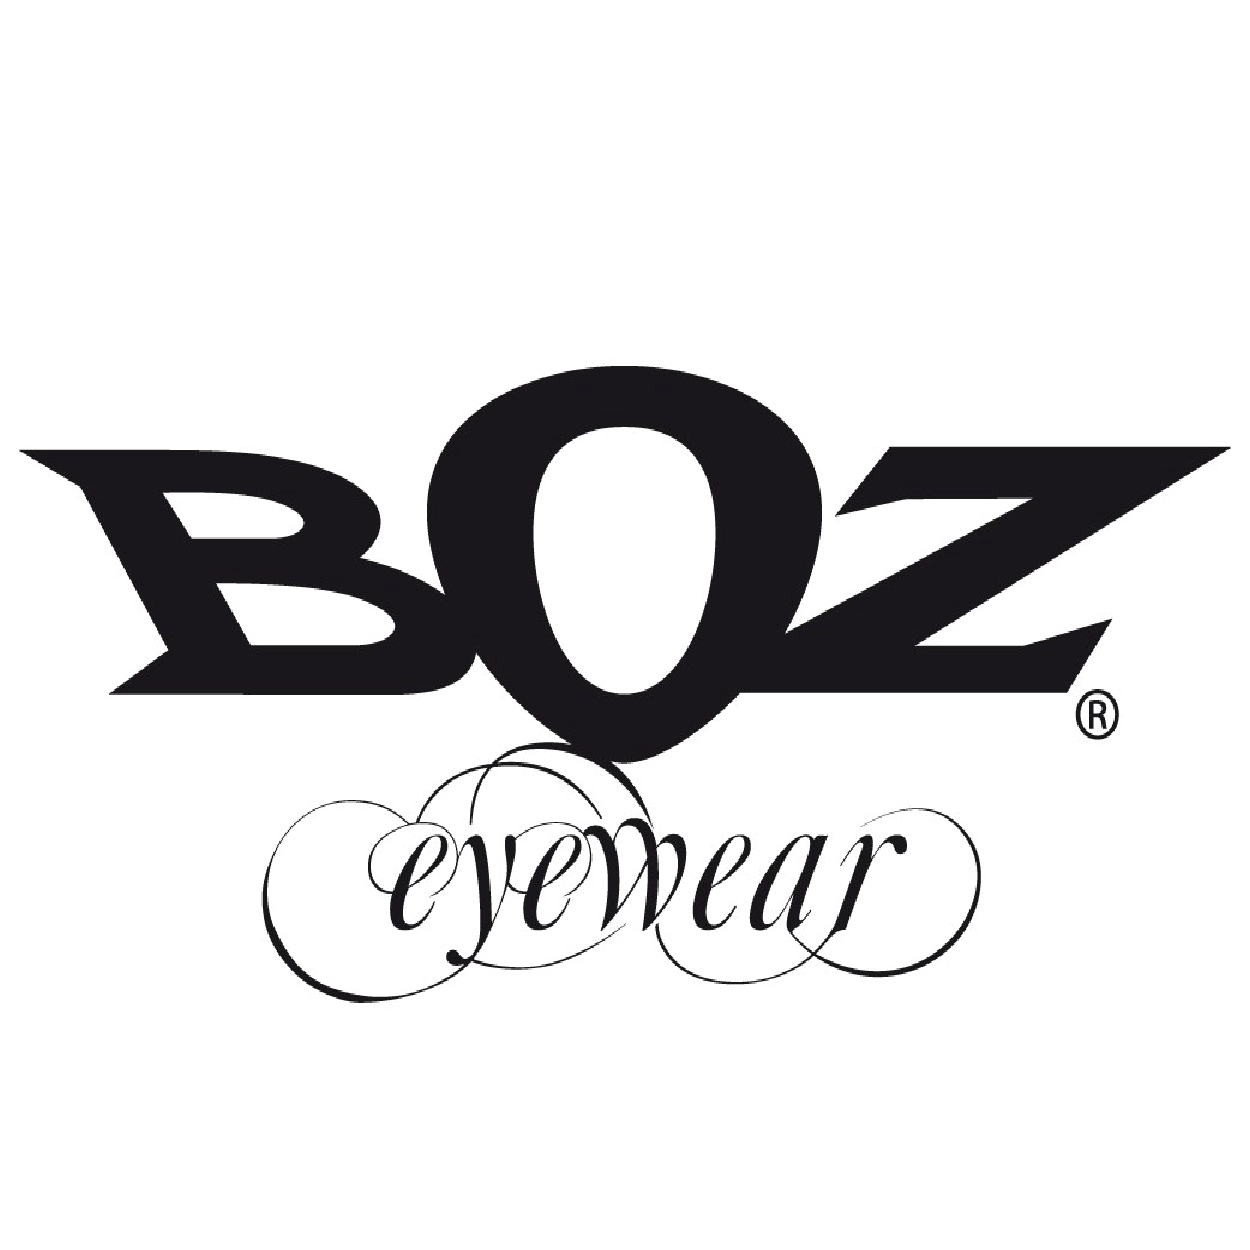 Boz Femmes